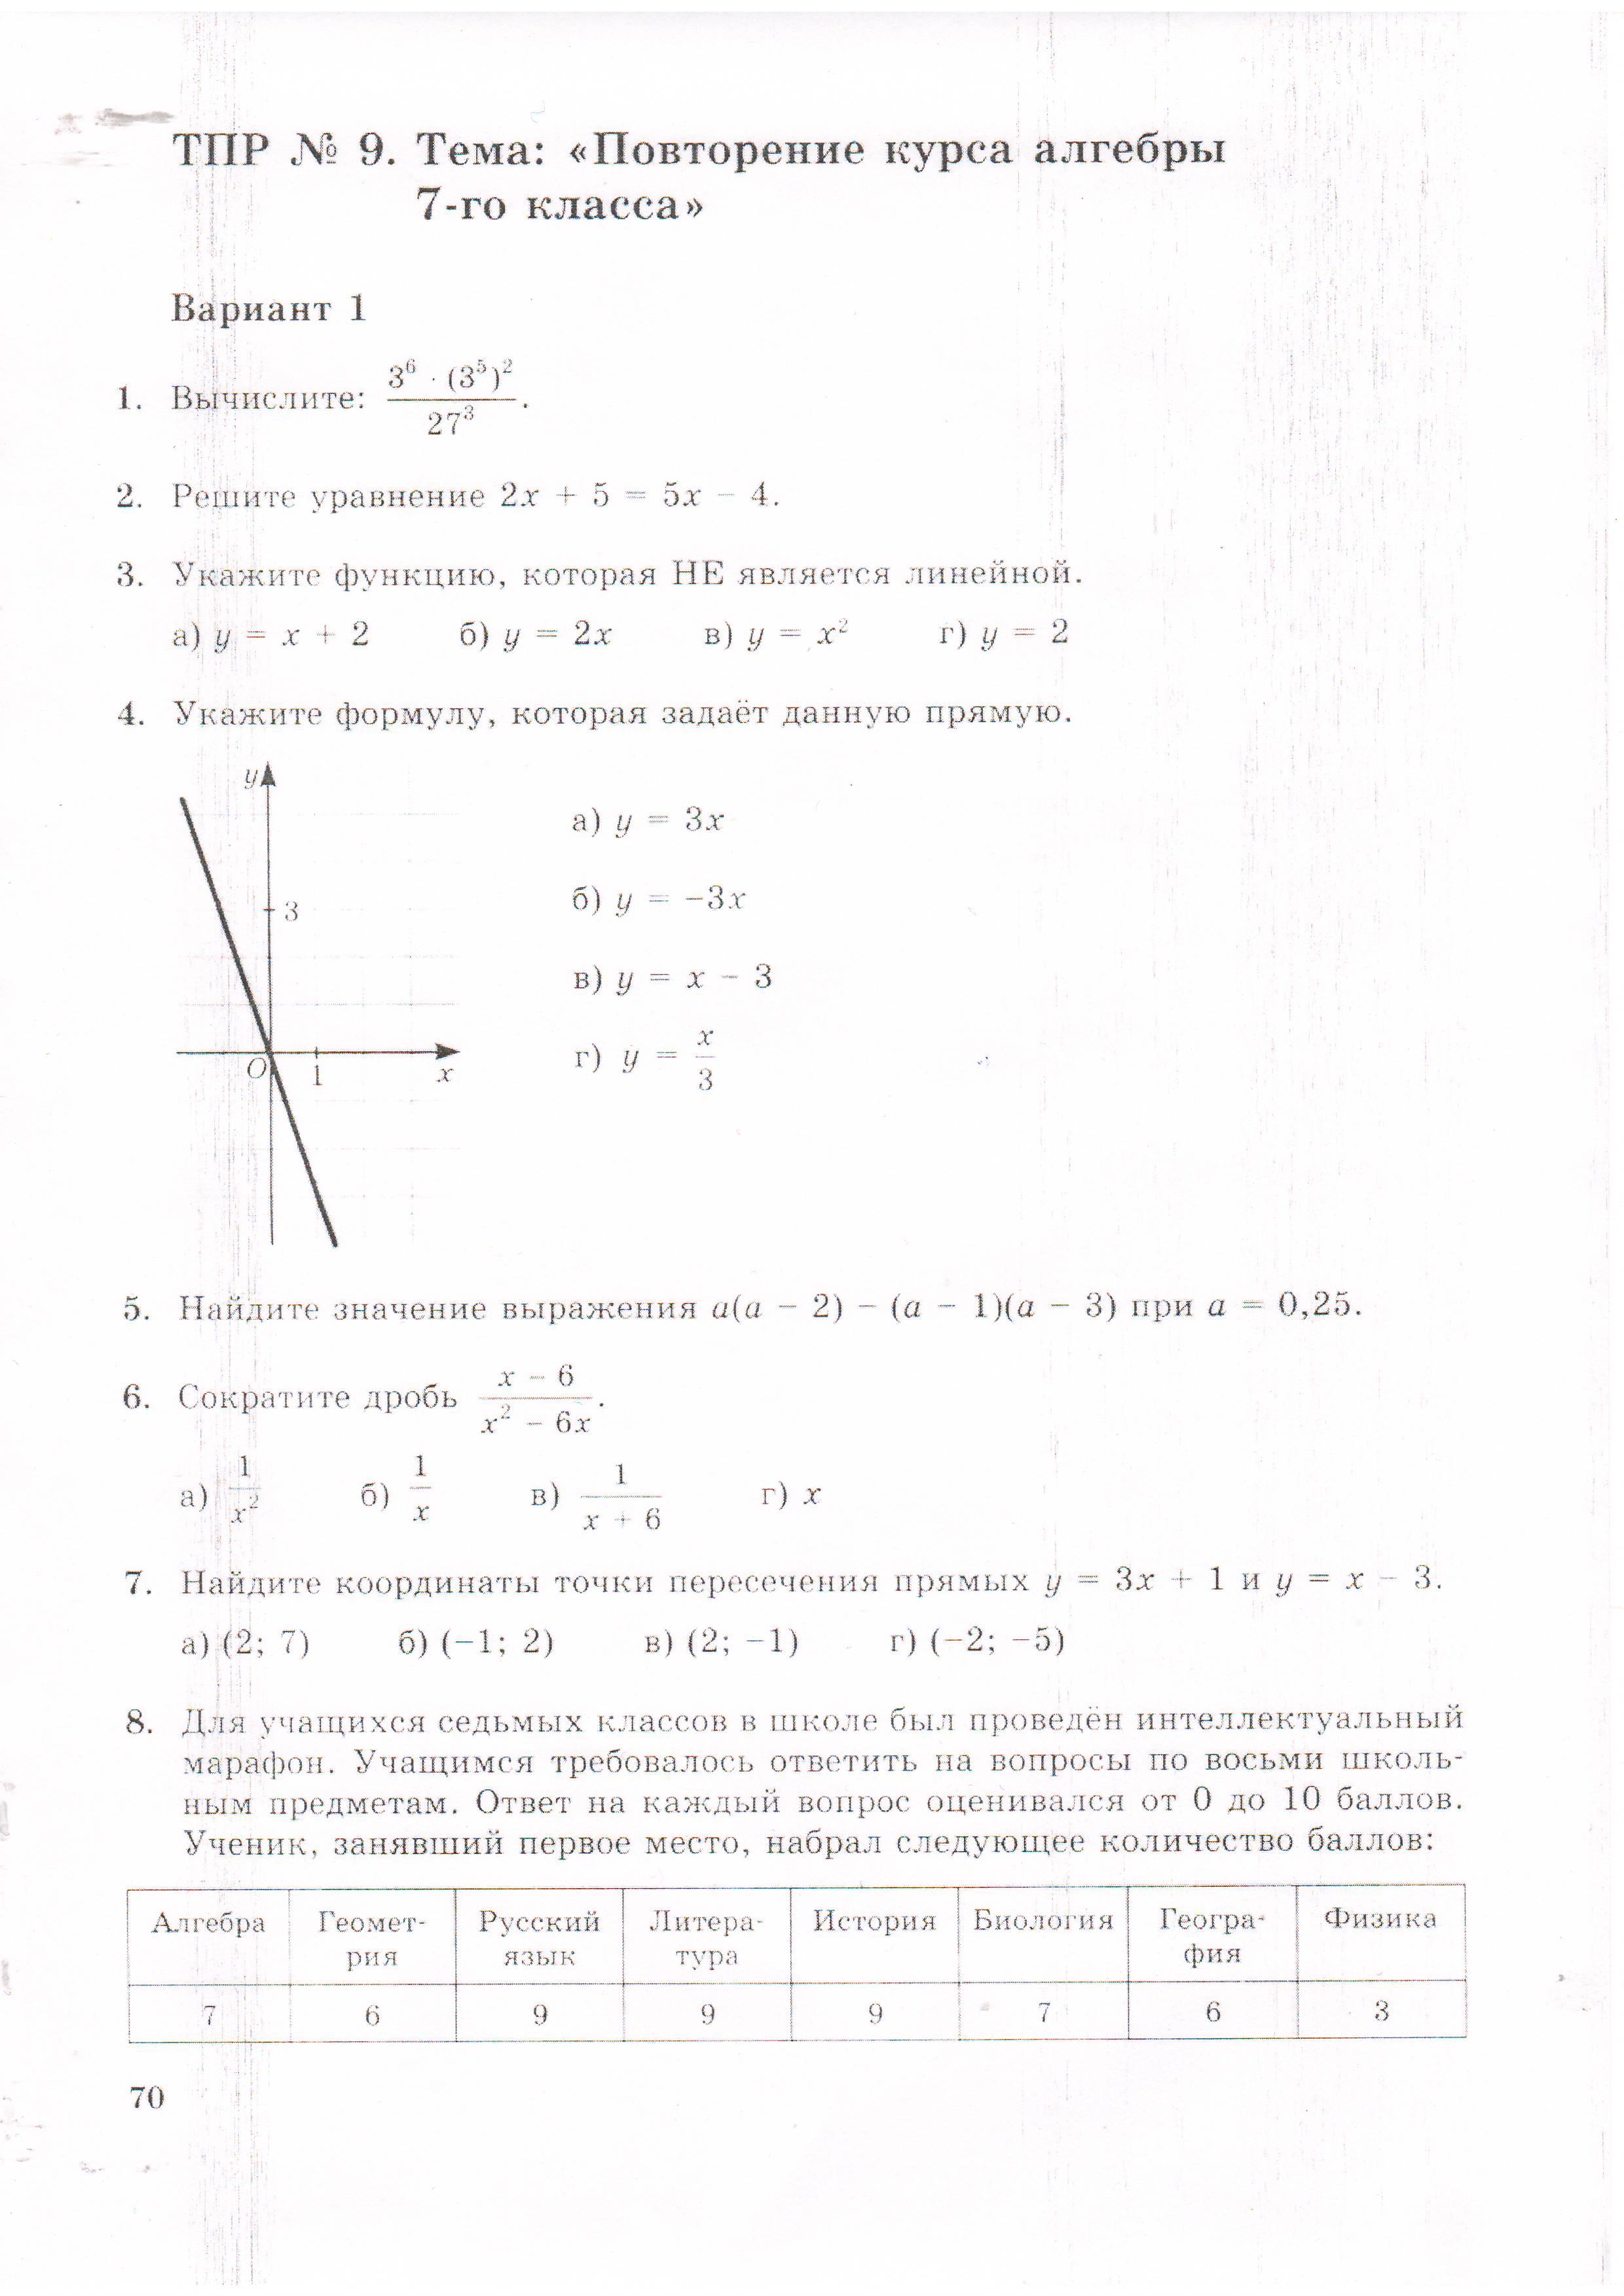 C:\Documents and Settings\Admin\Рабочий стол\Сканировать1.JPG